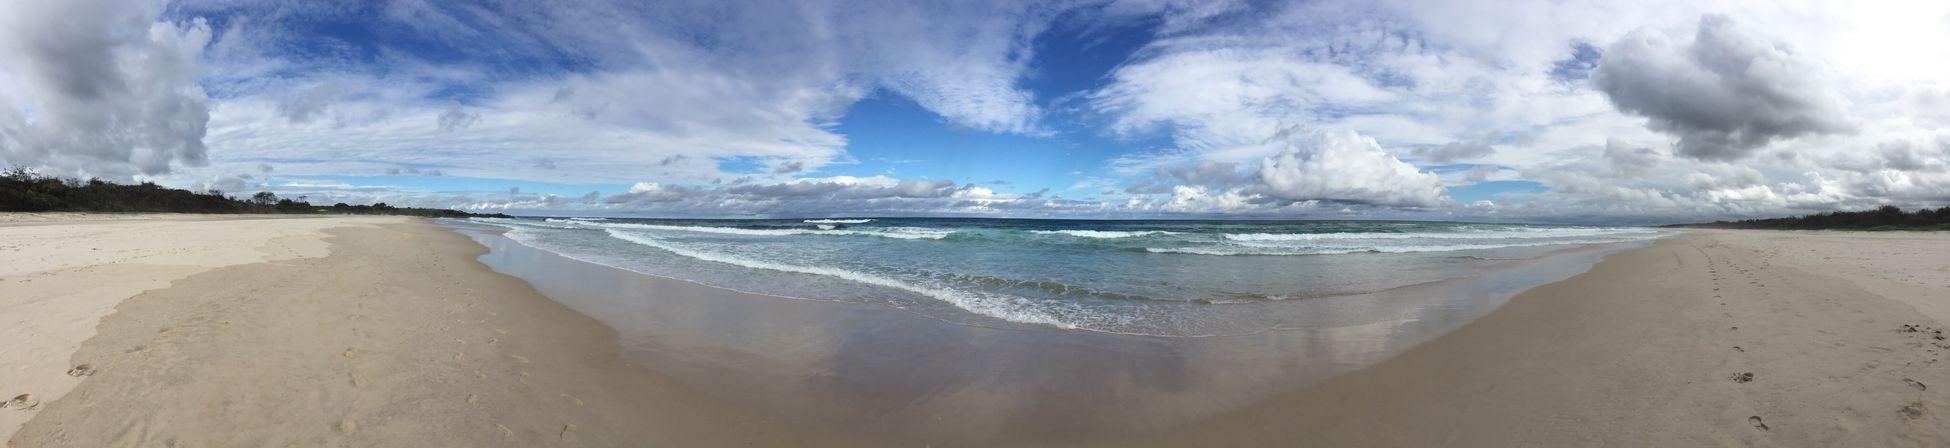 Kingscliff beach, Australia Beauty In Nature Beach Australian Landscape